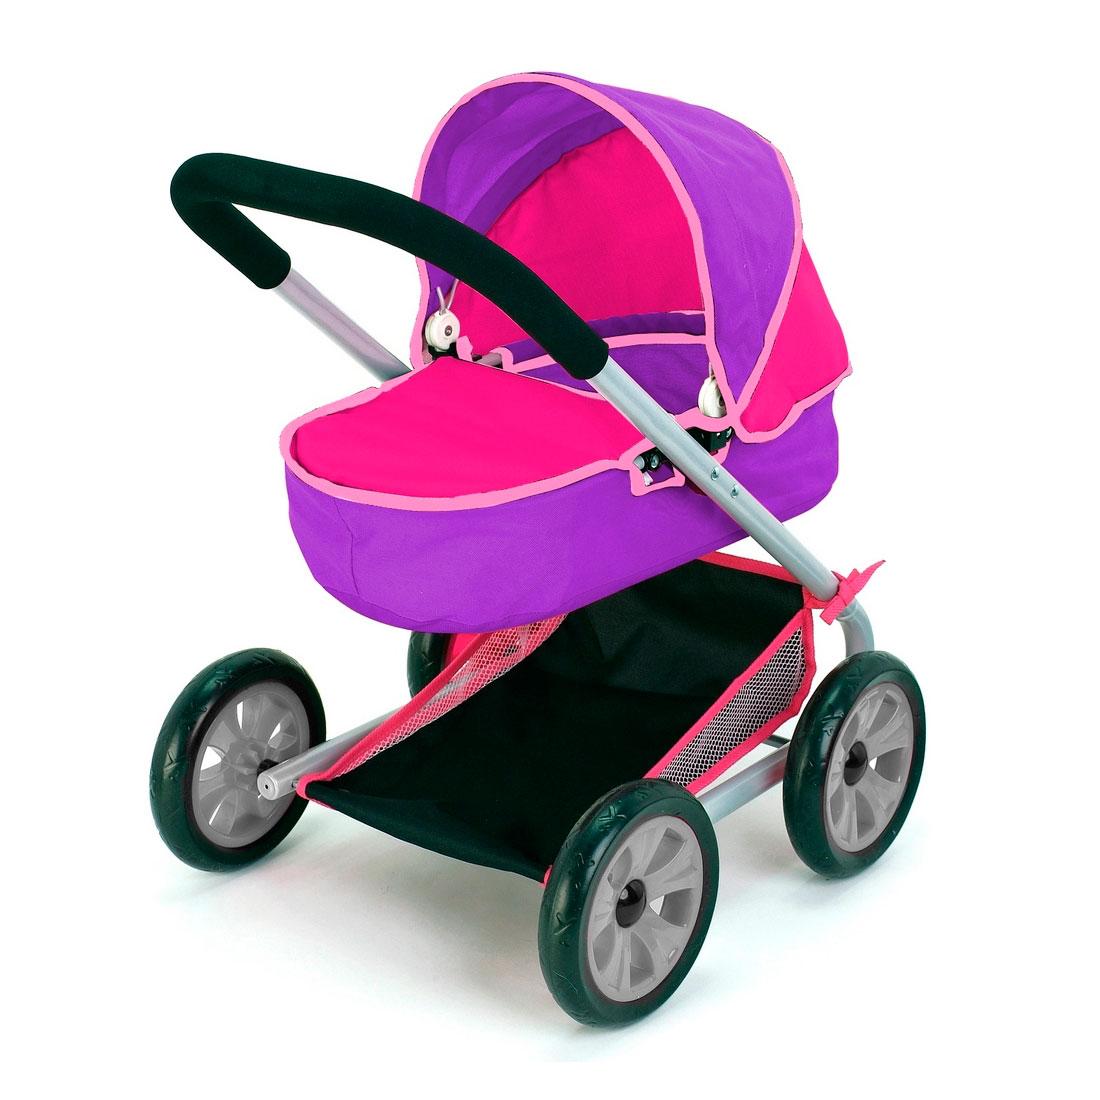 Кукольная коляска RT 639 Фиолетовый и фуксия<br>